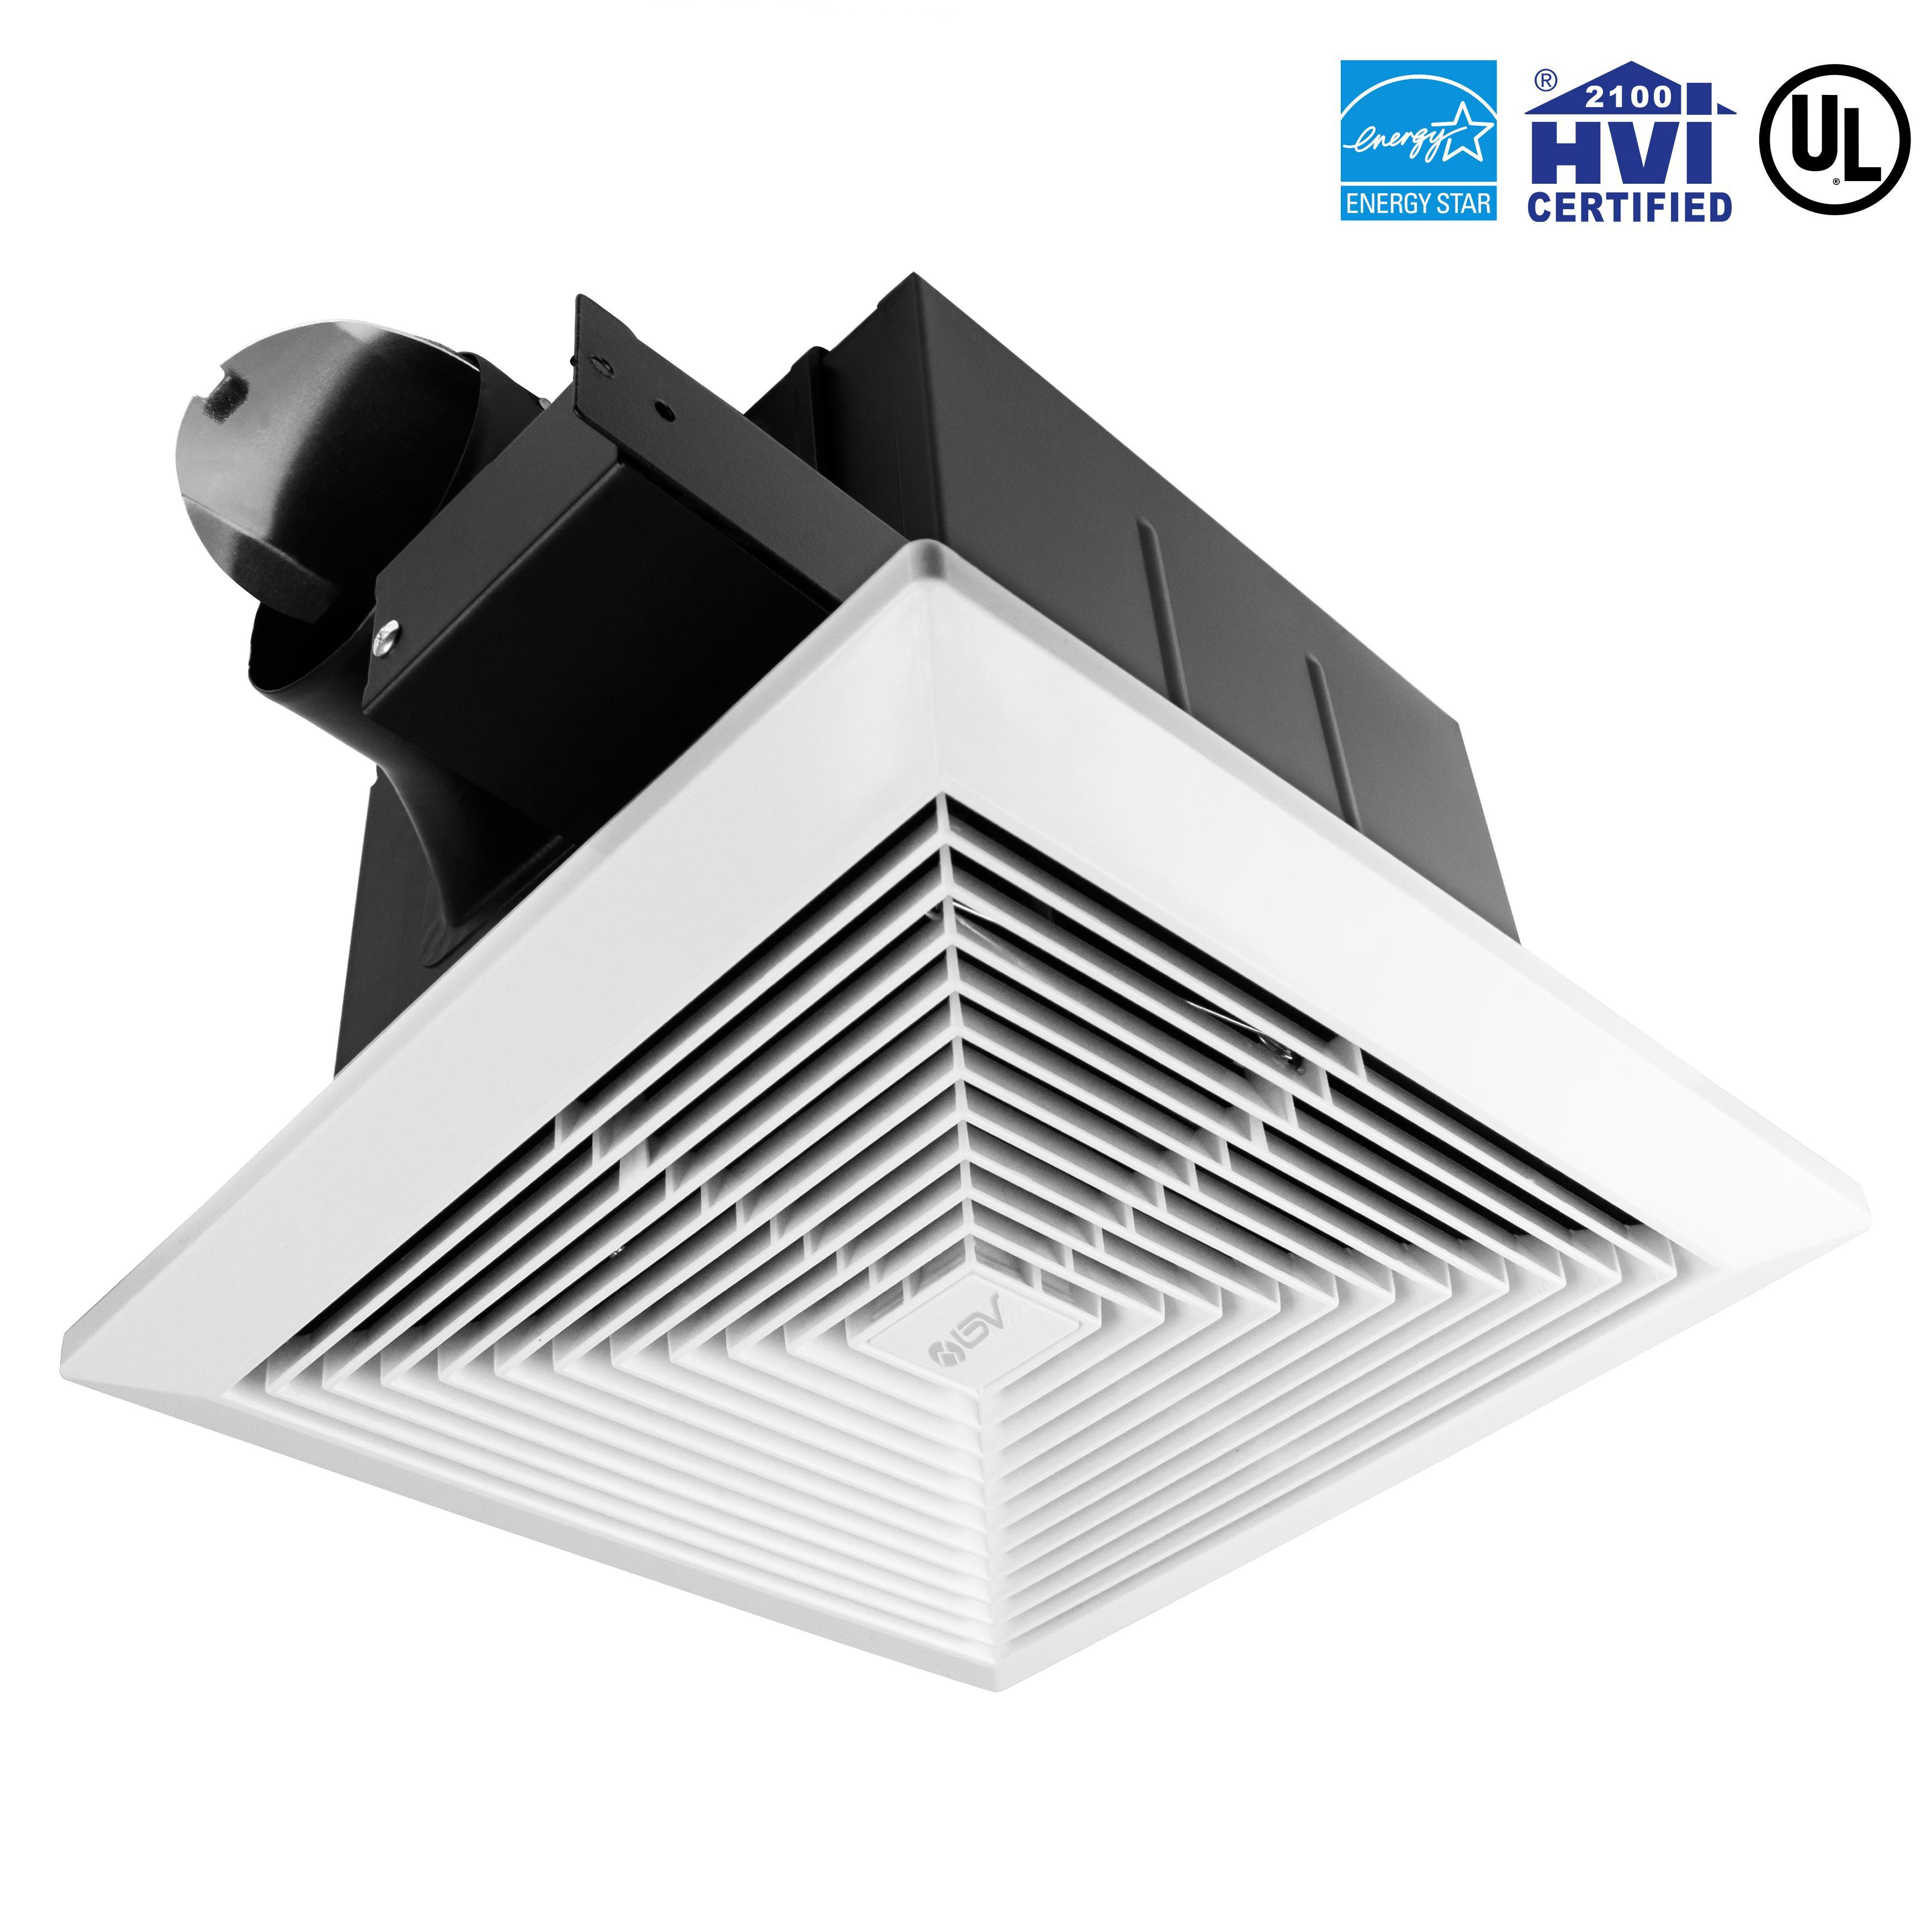 Bv Ultra Quiet 90 Cfm 0 7 Sone Bathroom Ventilation And Exhaust Fan Bathroom Fixture